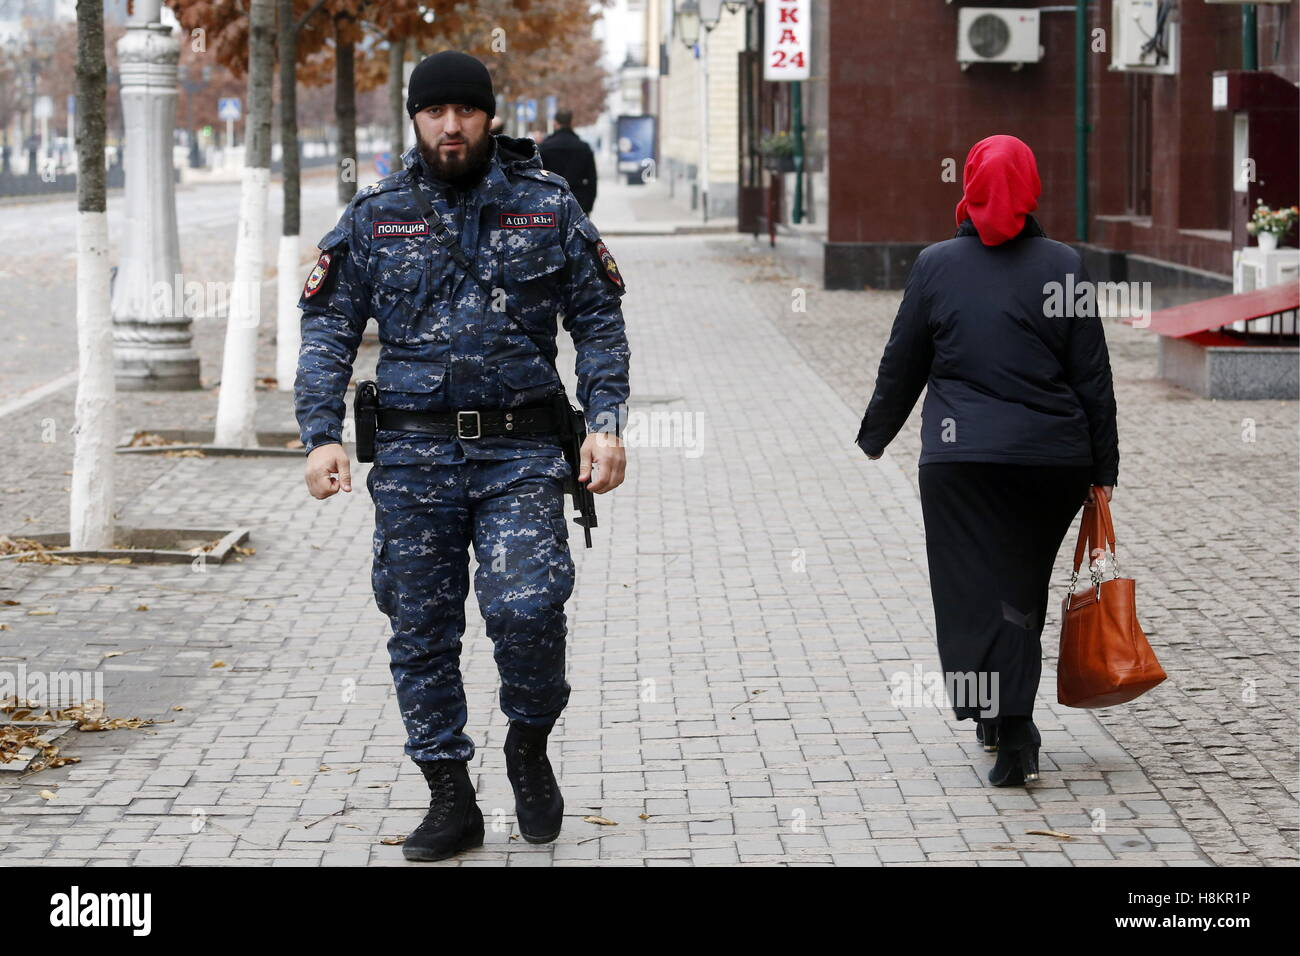 Grozny, Russia. 13th Nov, 2016. A policeman patrolling a city street. © Valery Matytsin/TASS/Alamy Live News - Stock Image